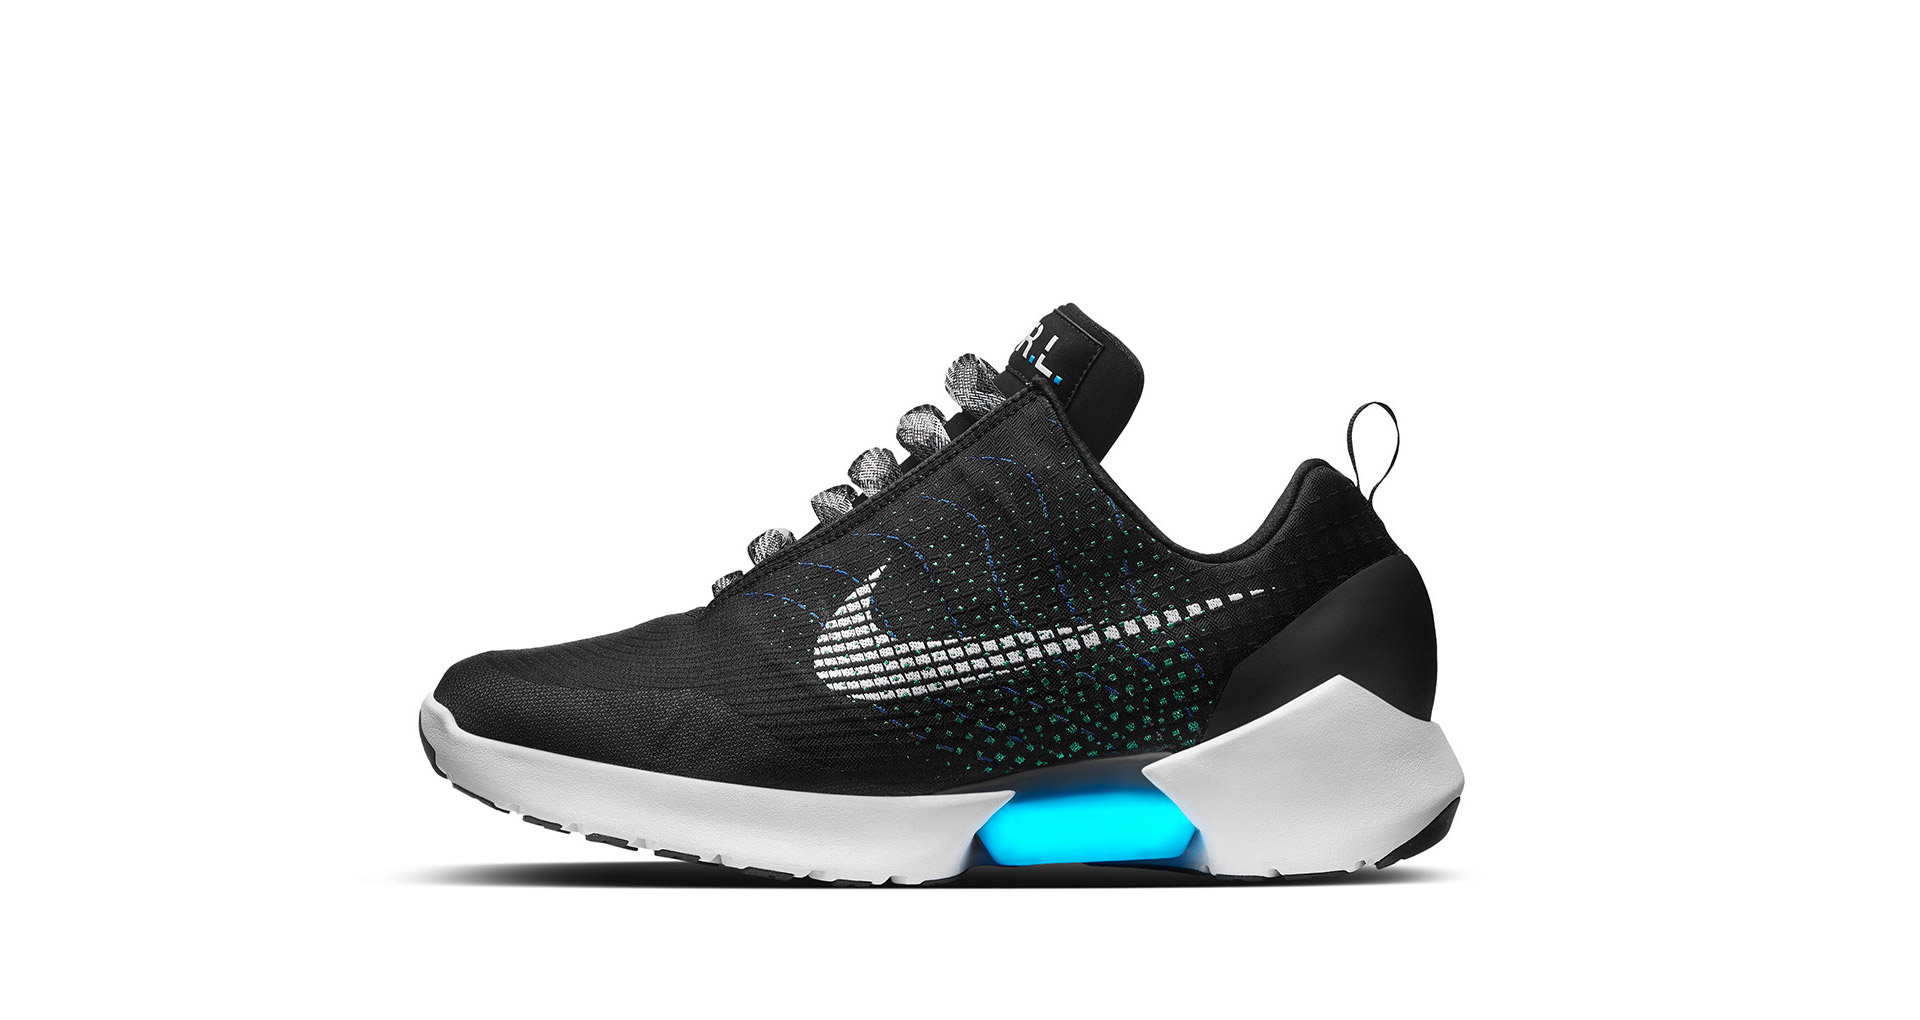 Nike HyperAdapt 1.0 Black